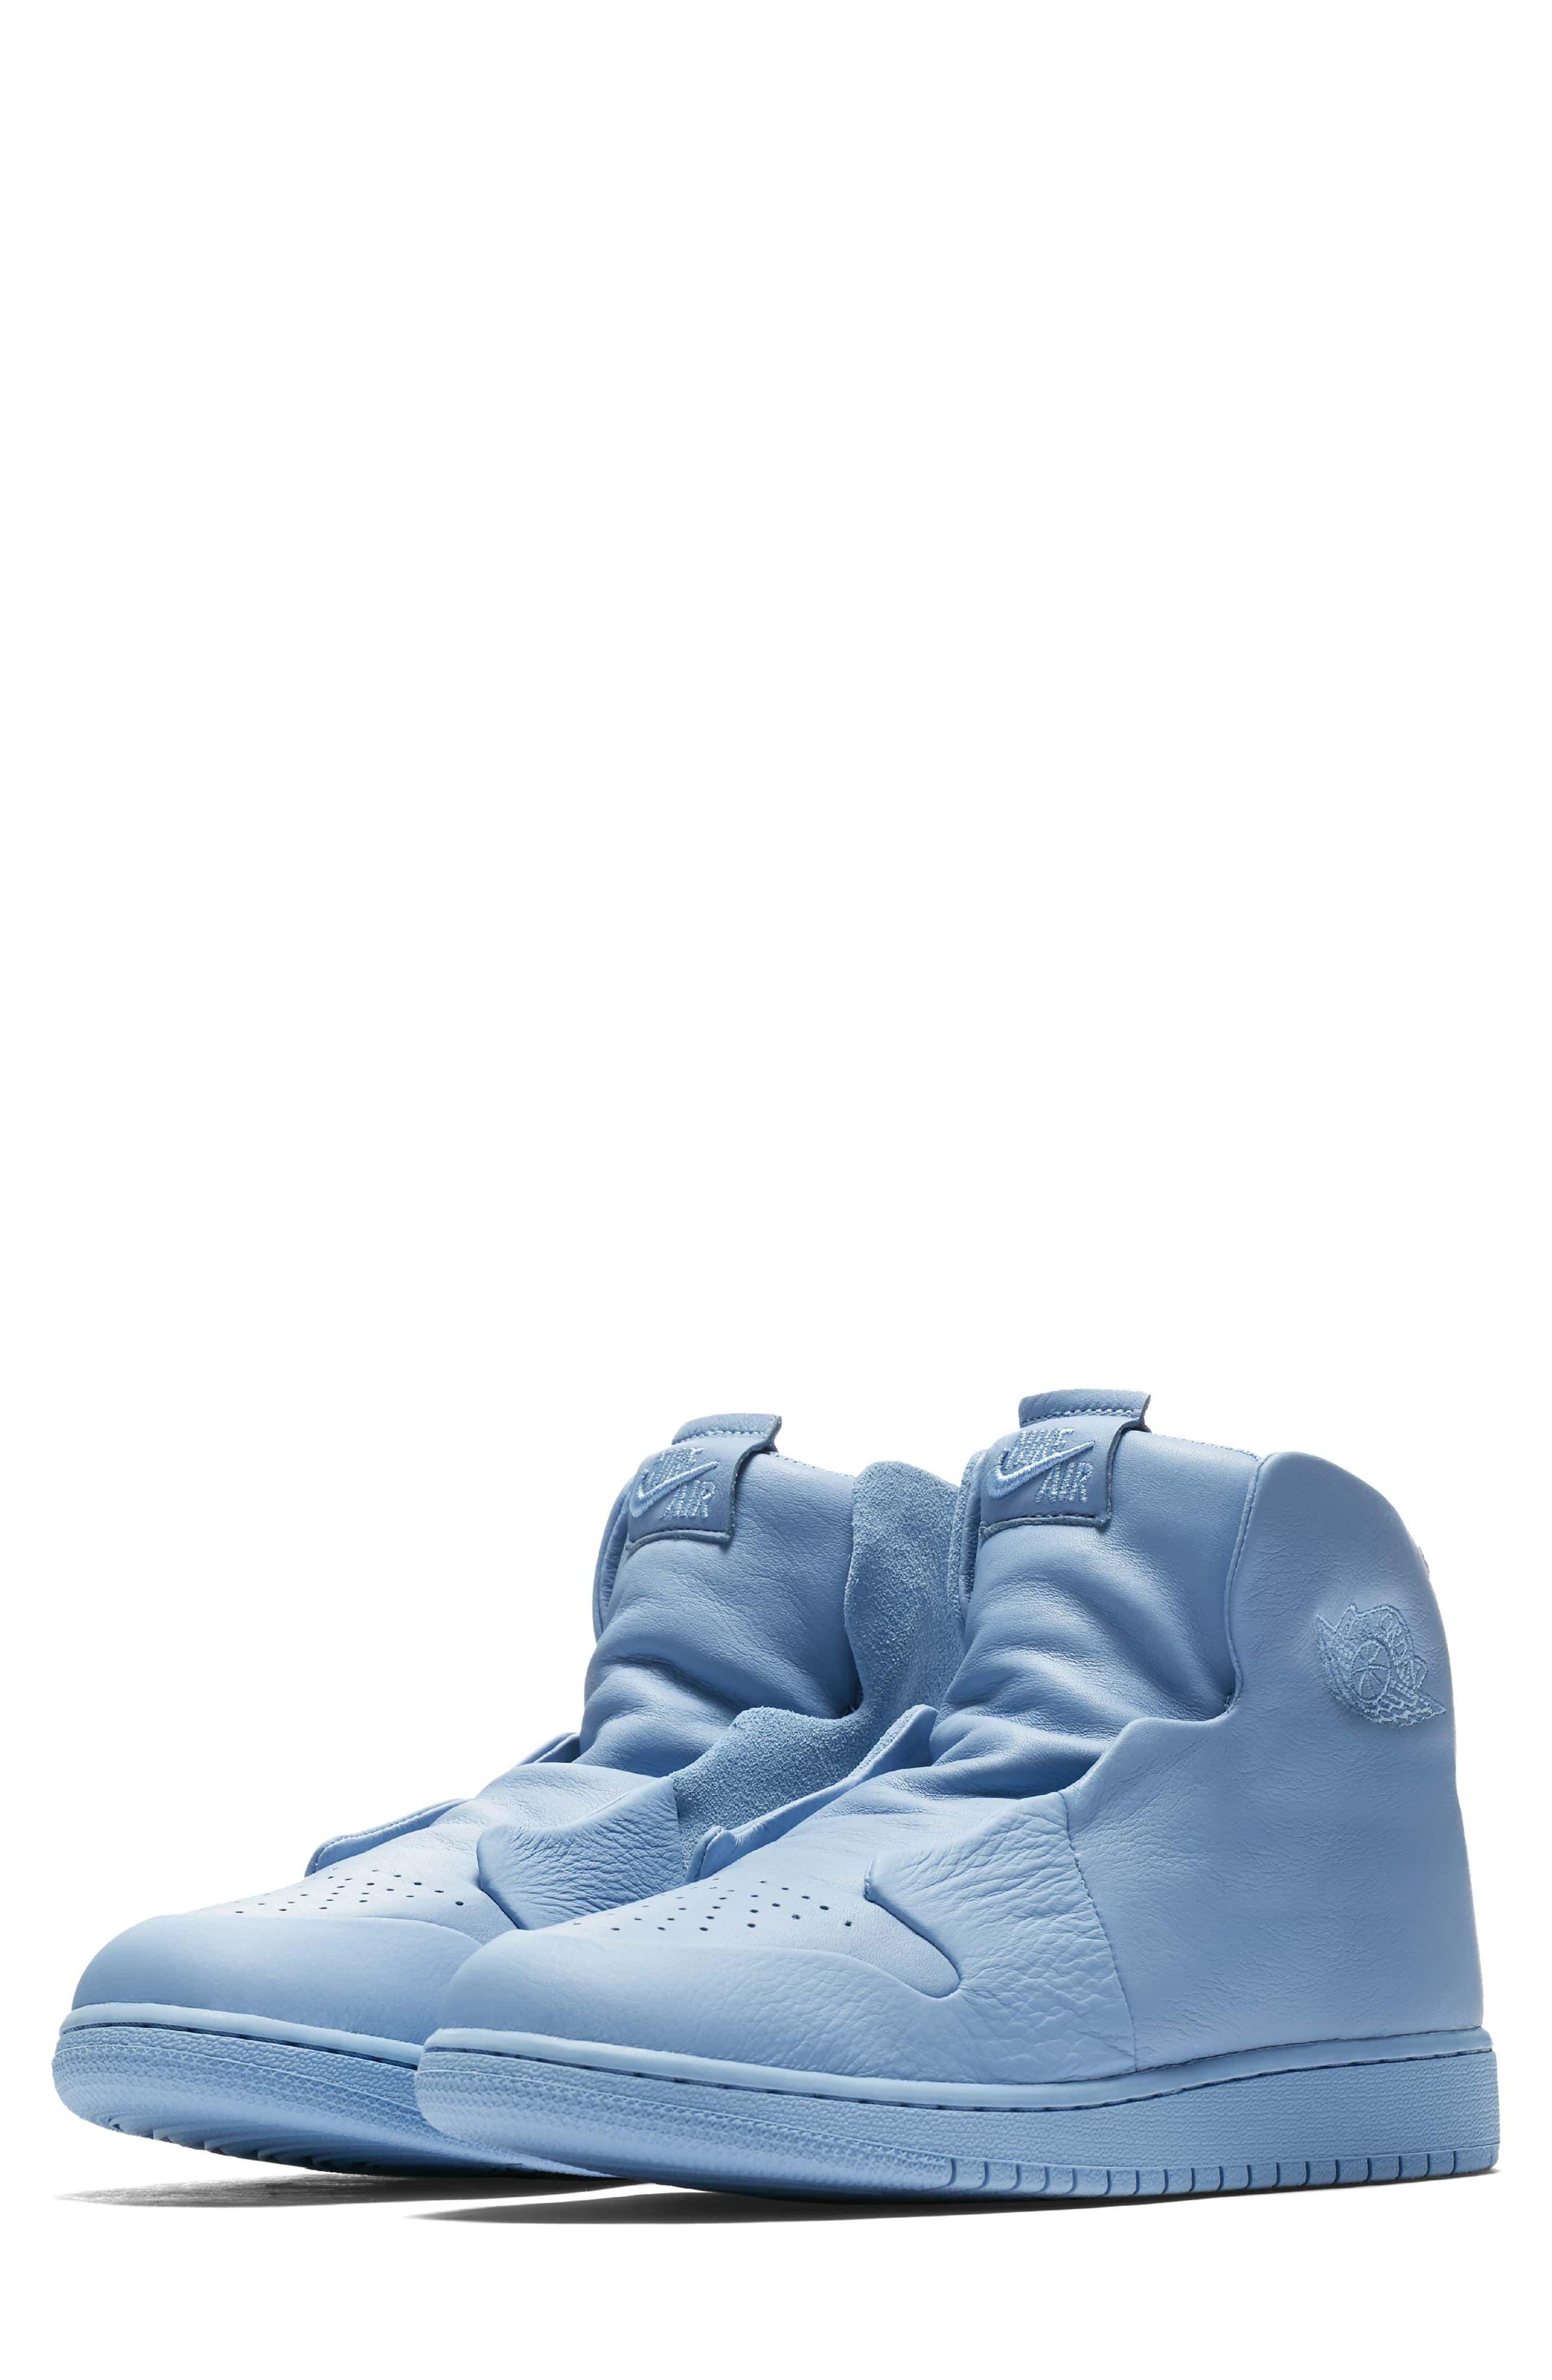 Air Jordan 1 Sage XX High Top Sneaker,                             Main thumbnail 1, color,                             Light Blue